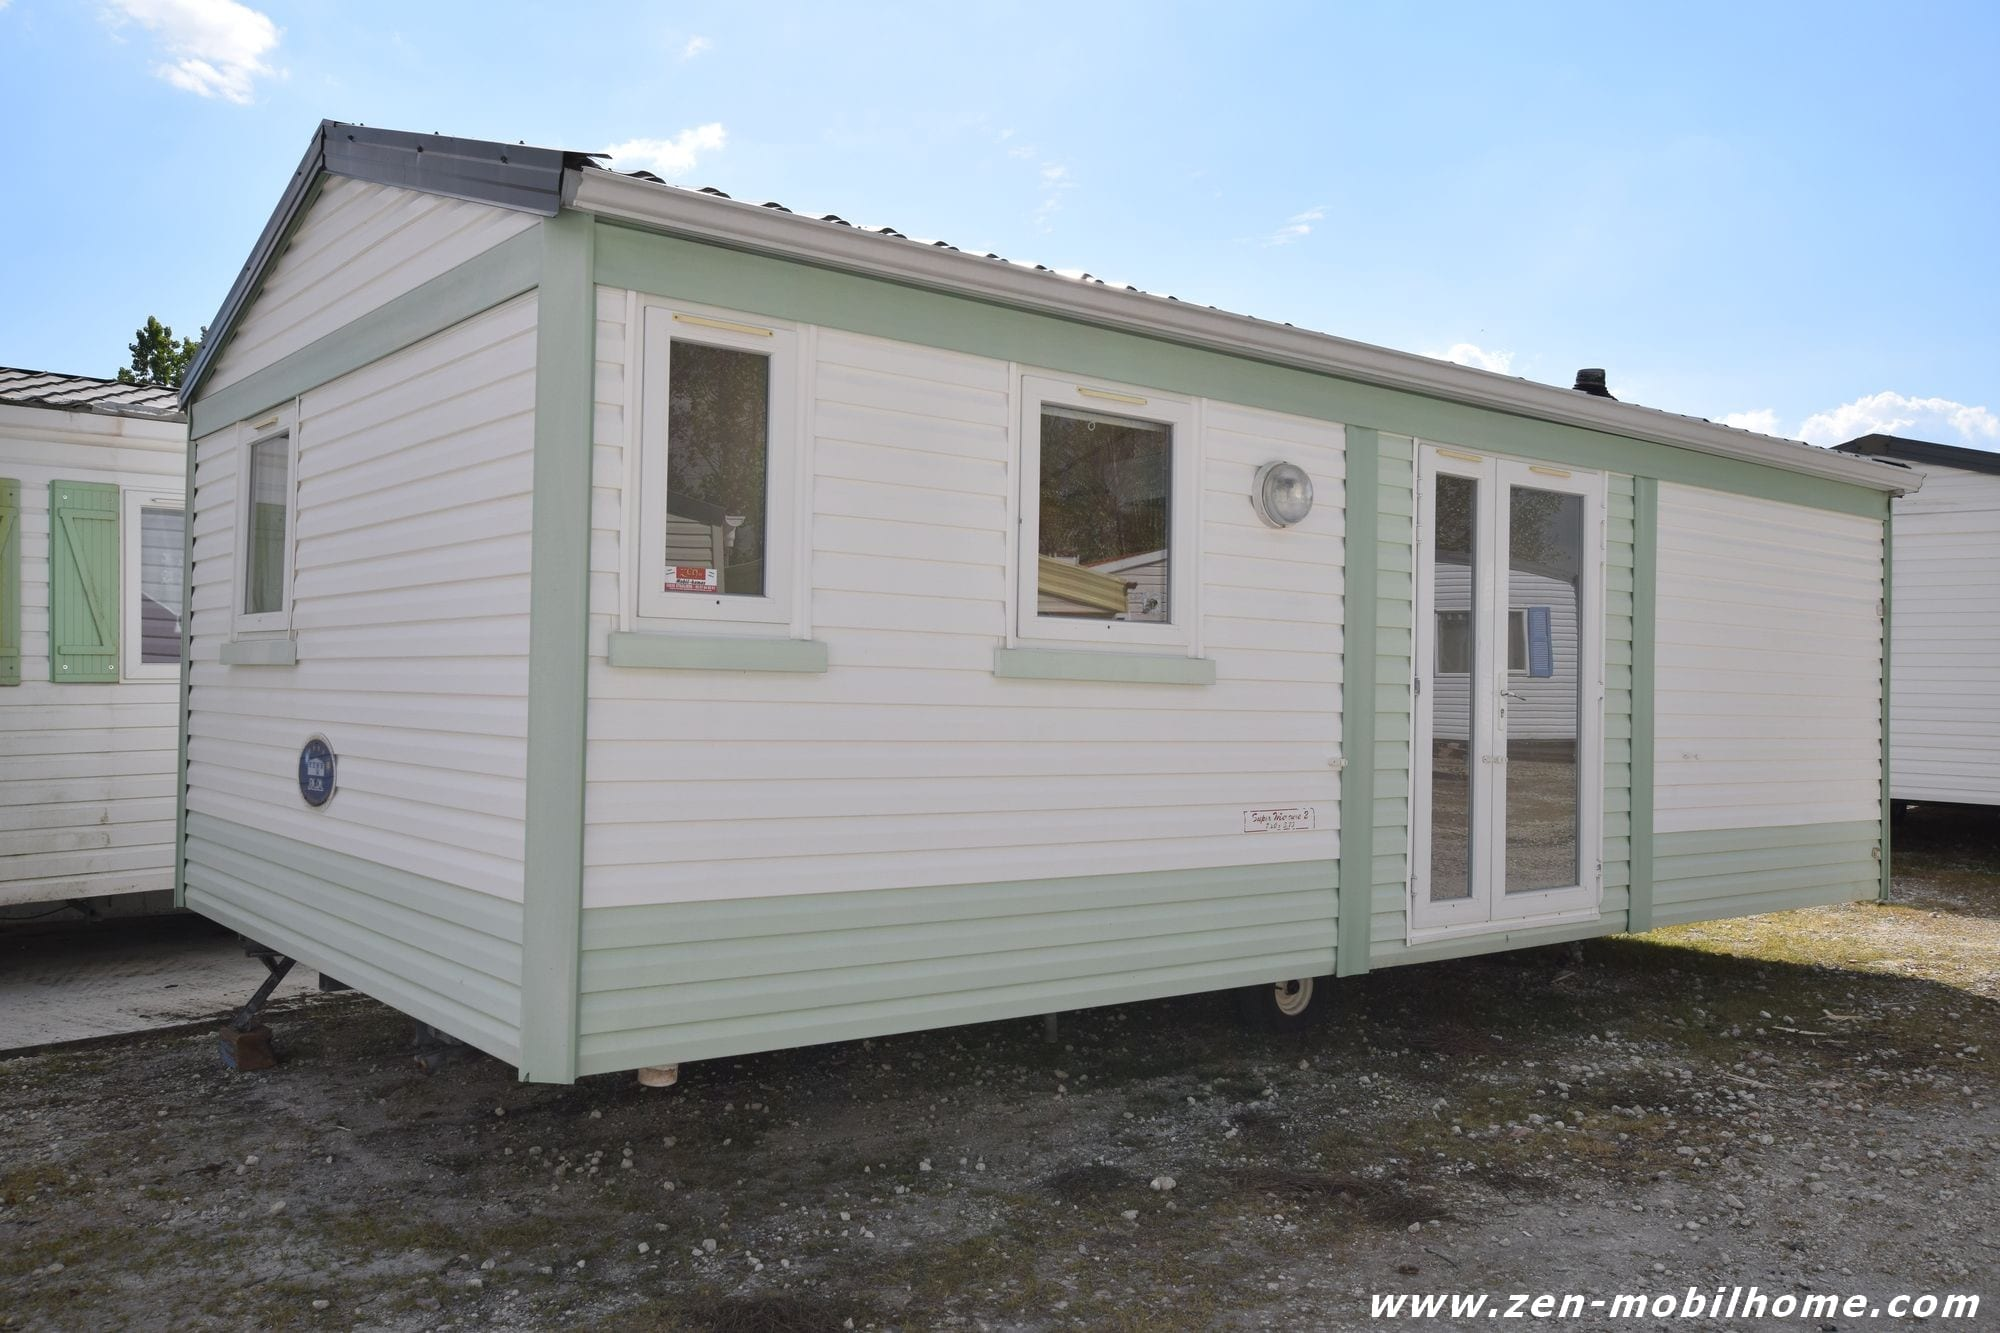 irm super mercure mobil home d 39 occasion 5 500 zen mobil homes. Black Bedroom Furniture Sets. Home Design Ideas